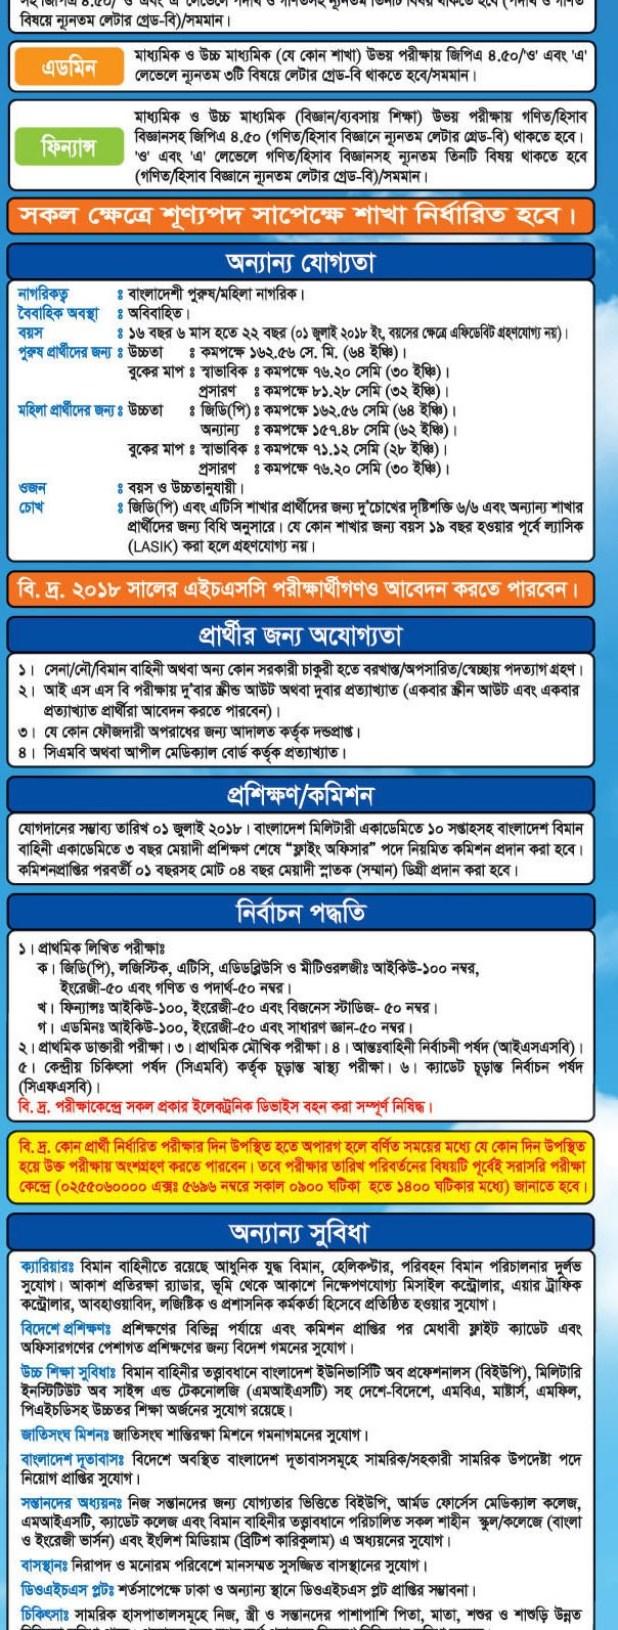 Air Force Job Circular 2018 - Govt Jobs In_bangladesh